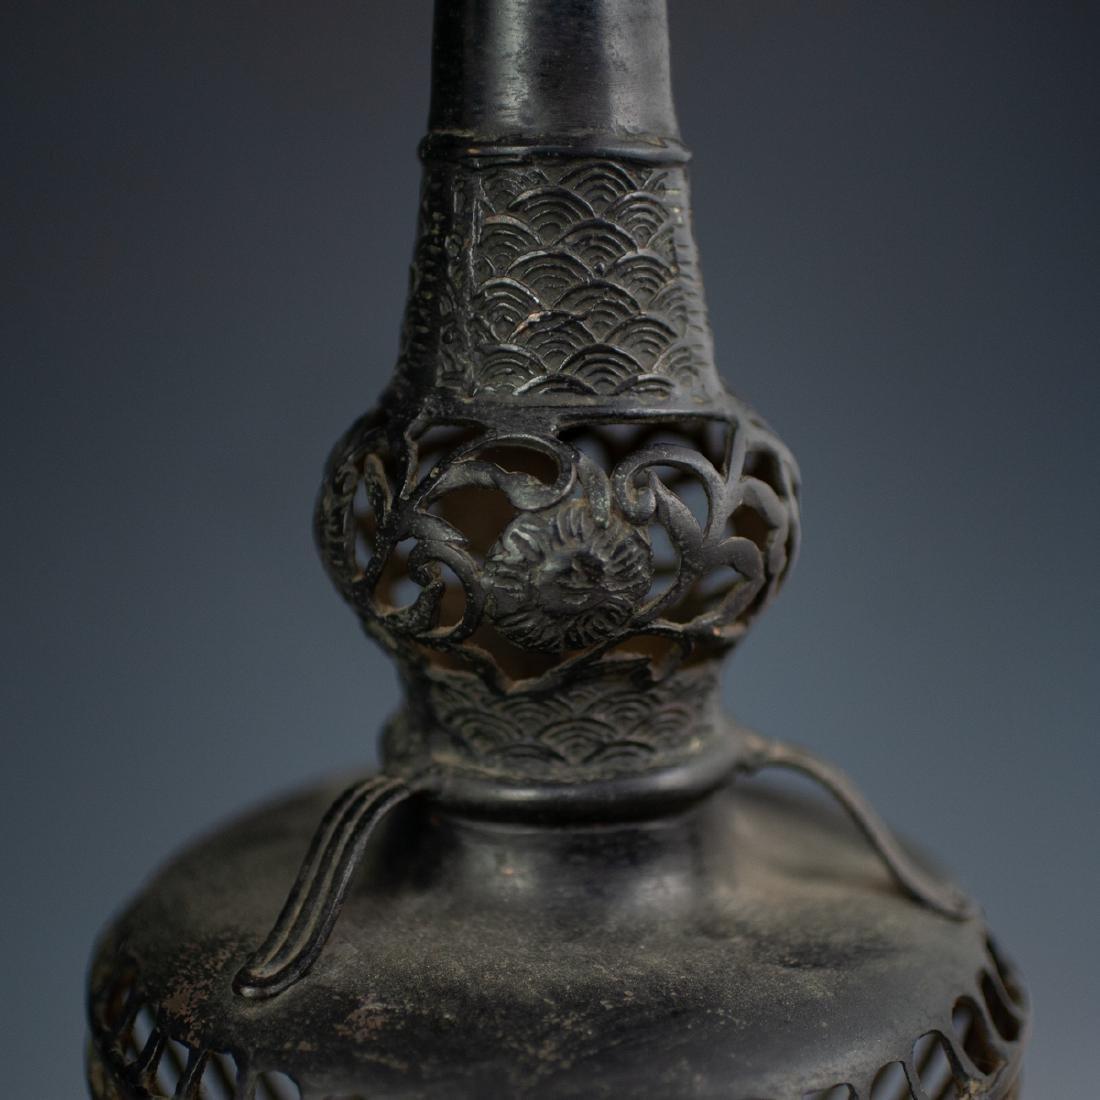 Japanese Bronze Altar Candlesticks - 4